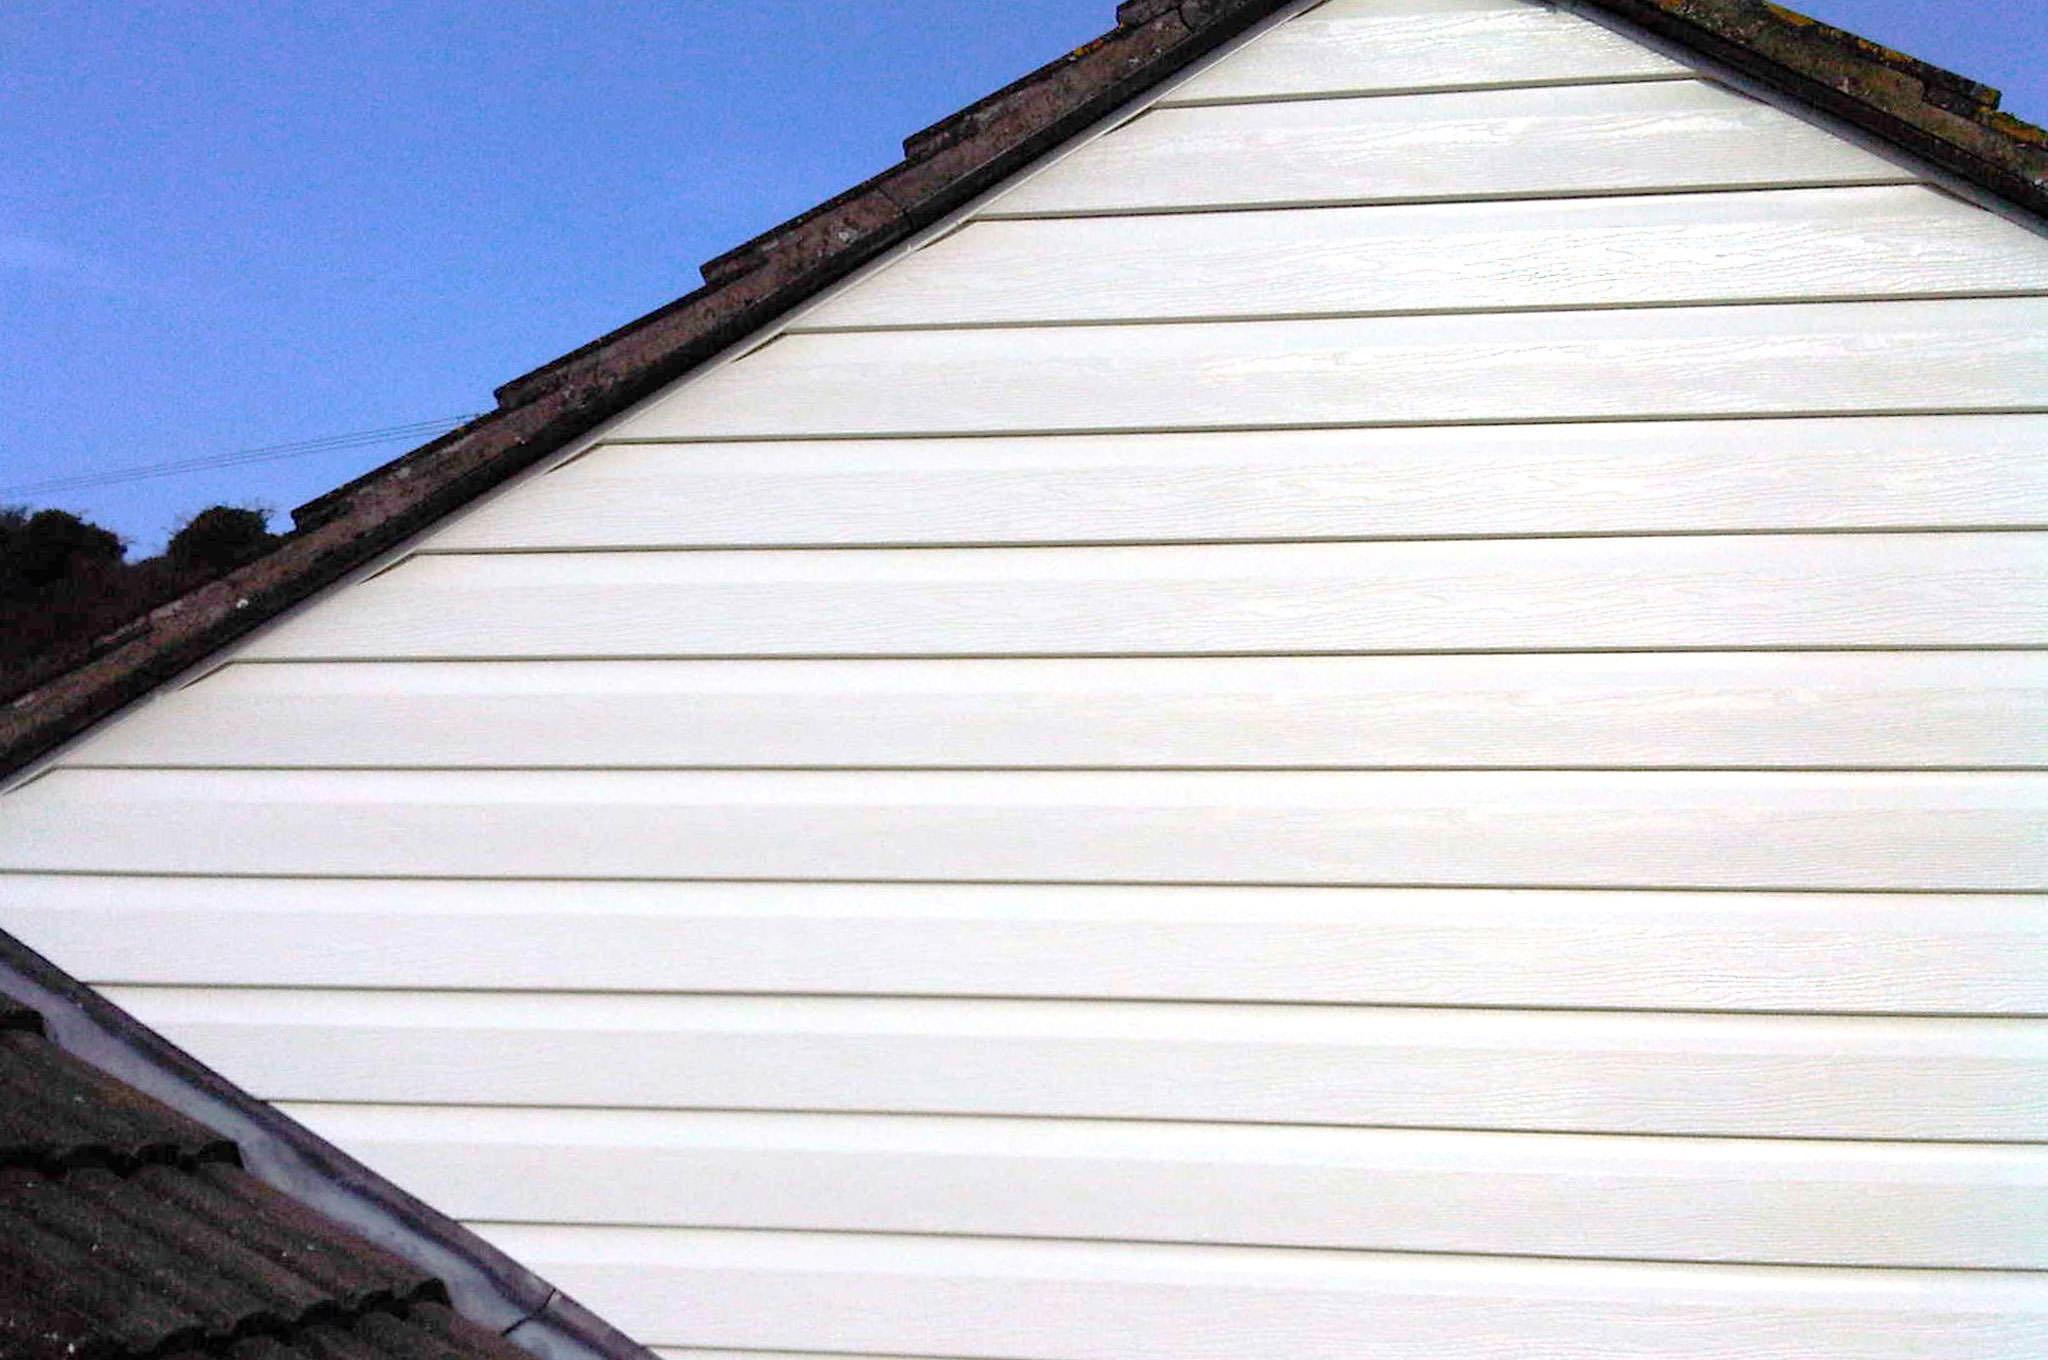 Roofline Fascias Upvc Cladding Amp Guttering Southampton